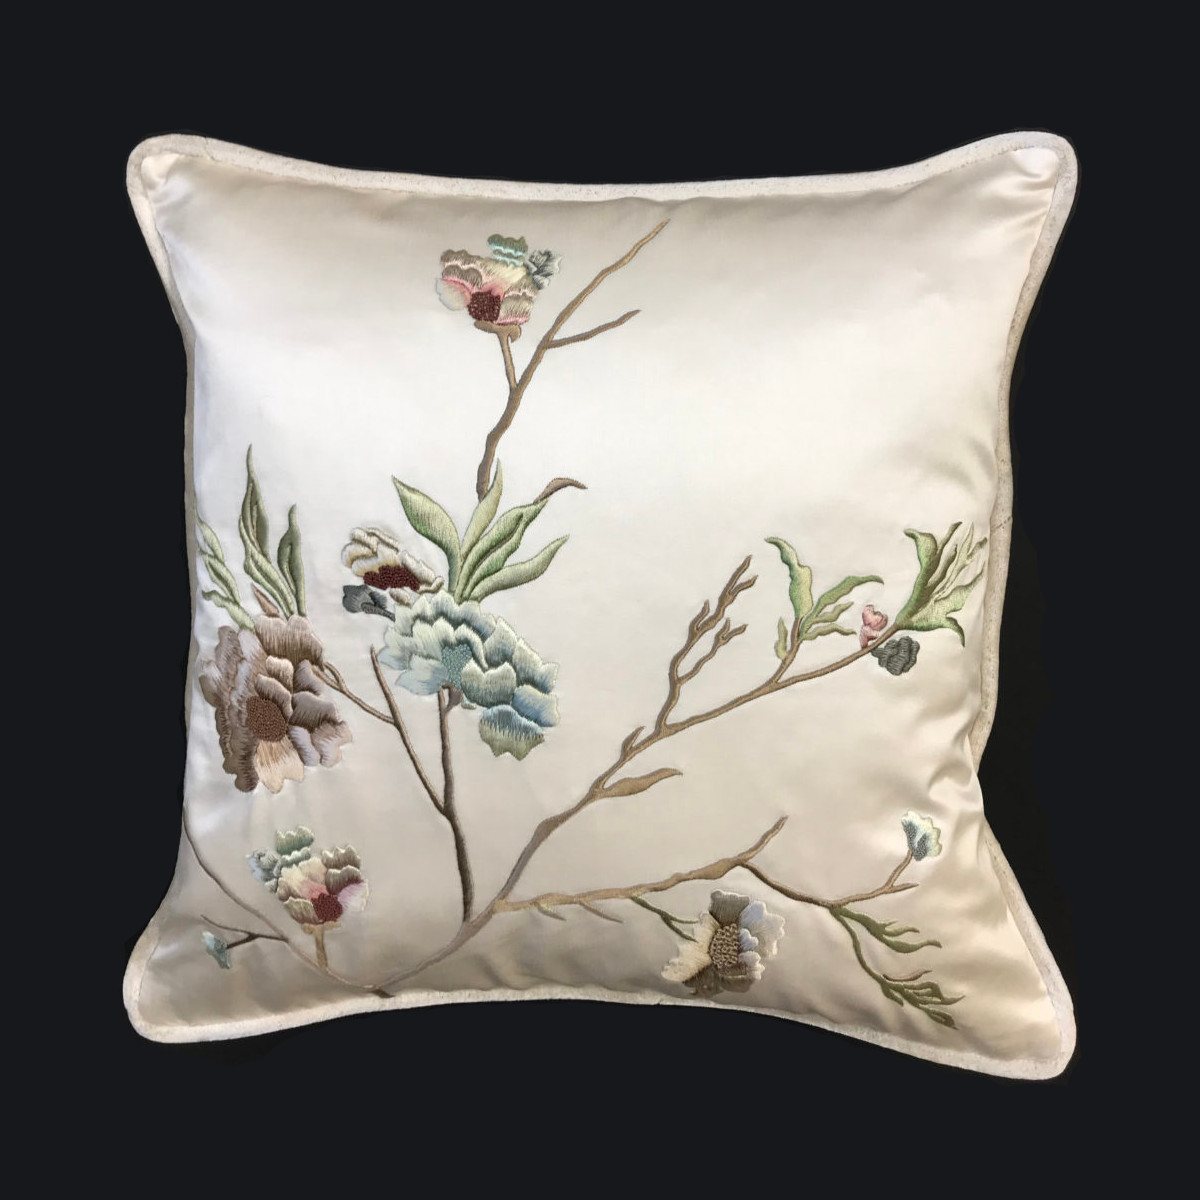 Palestrina London - Chinese Blossom cushion